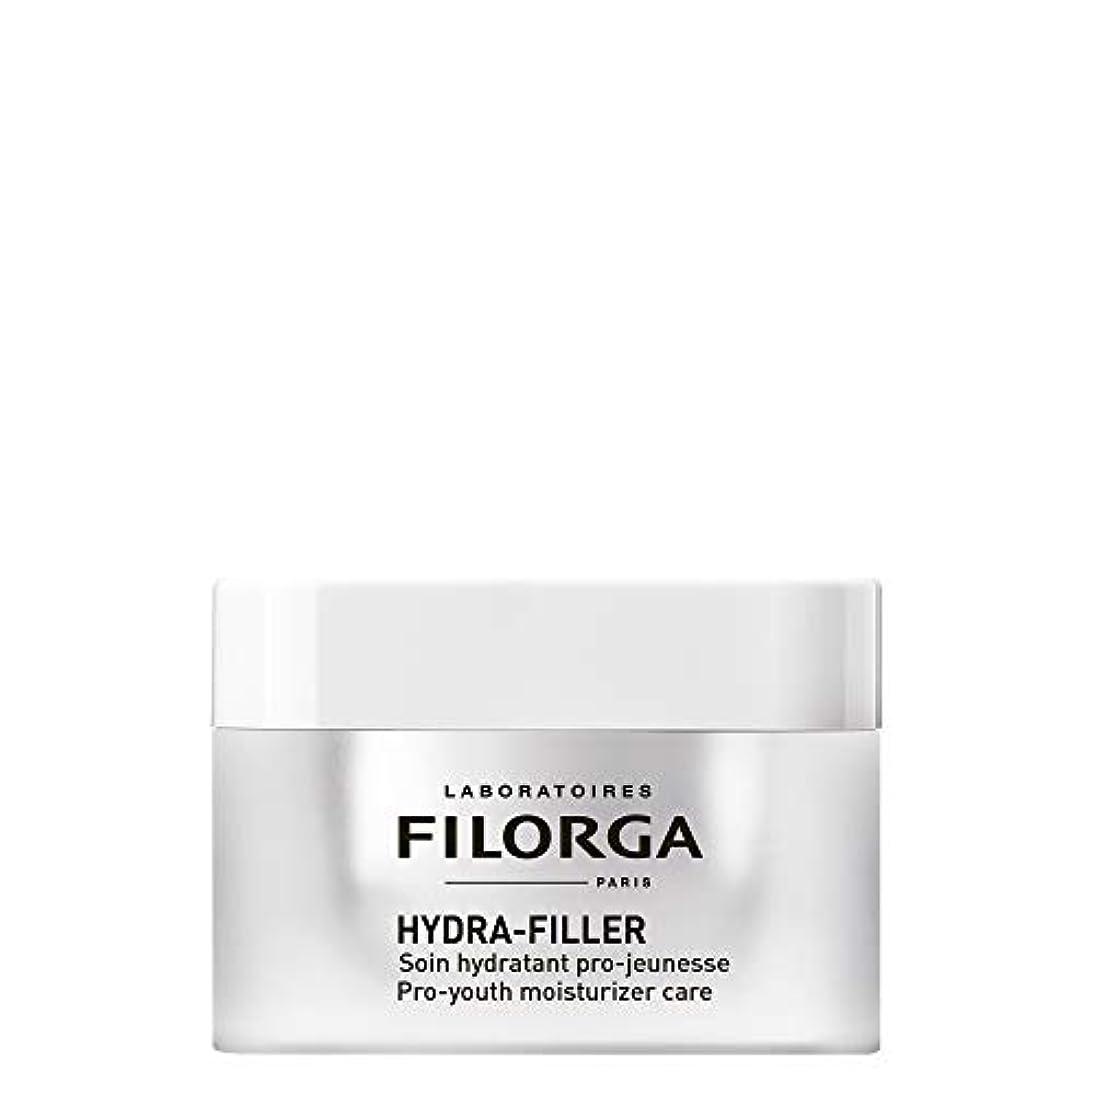 農夫粒地区Filorga Hydra-Filler Crema Hidratante Rejuvenecedora 50Ml